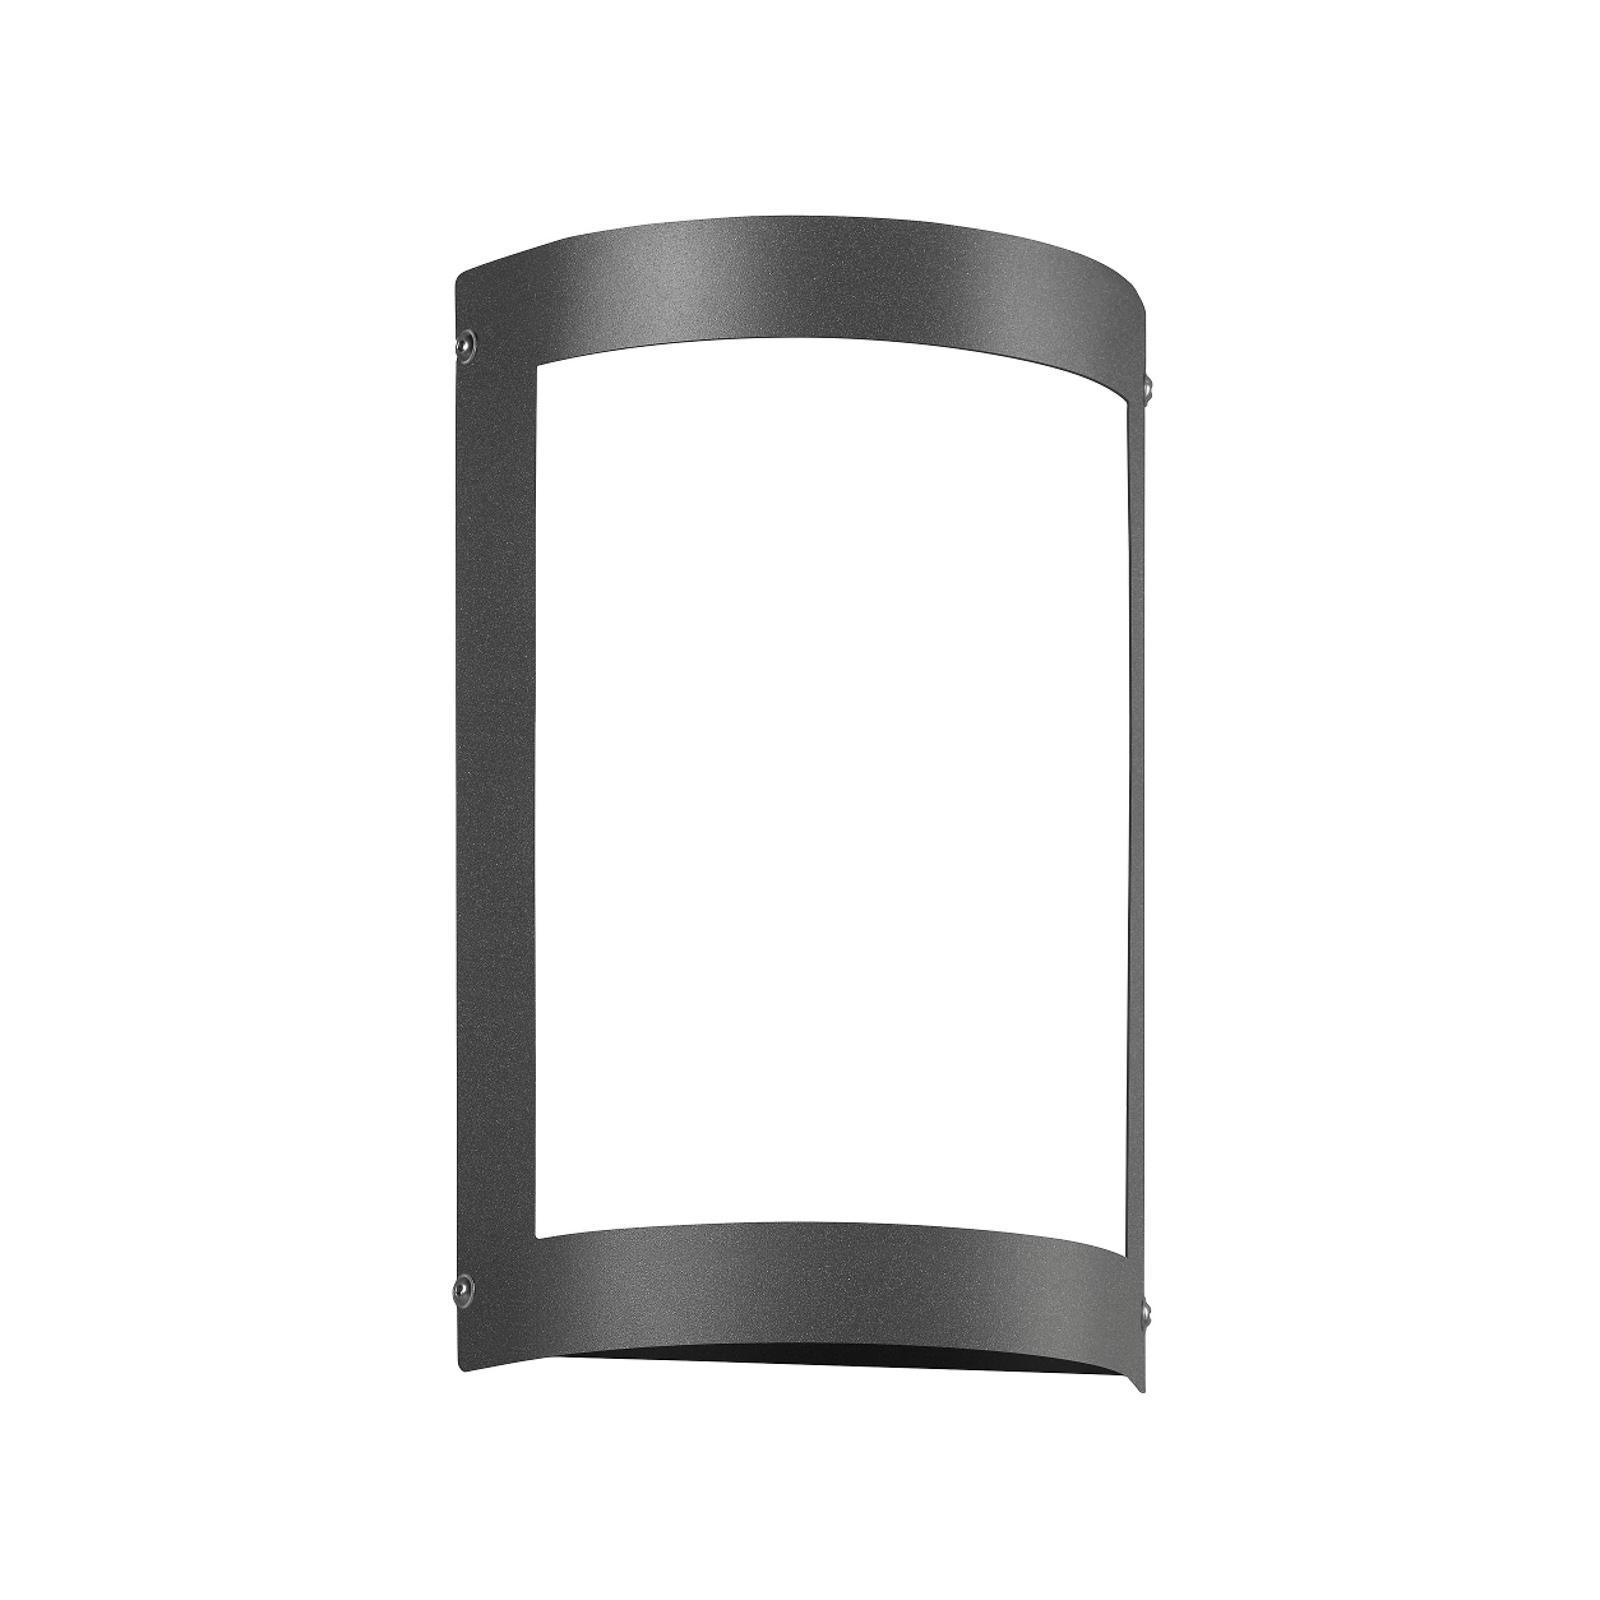 LED-utomhuslampa Aqua Marco utan raster, antracit